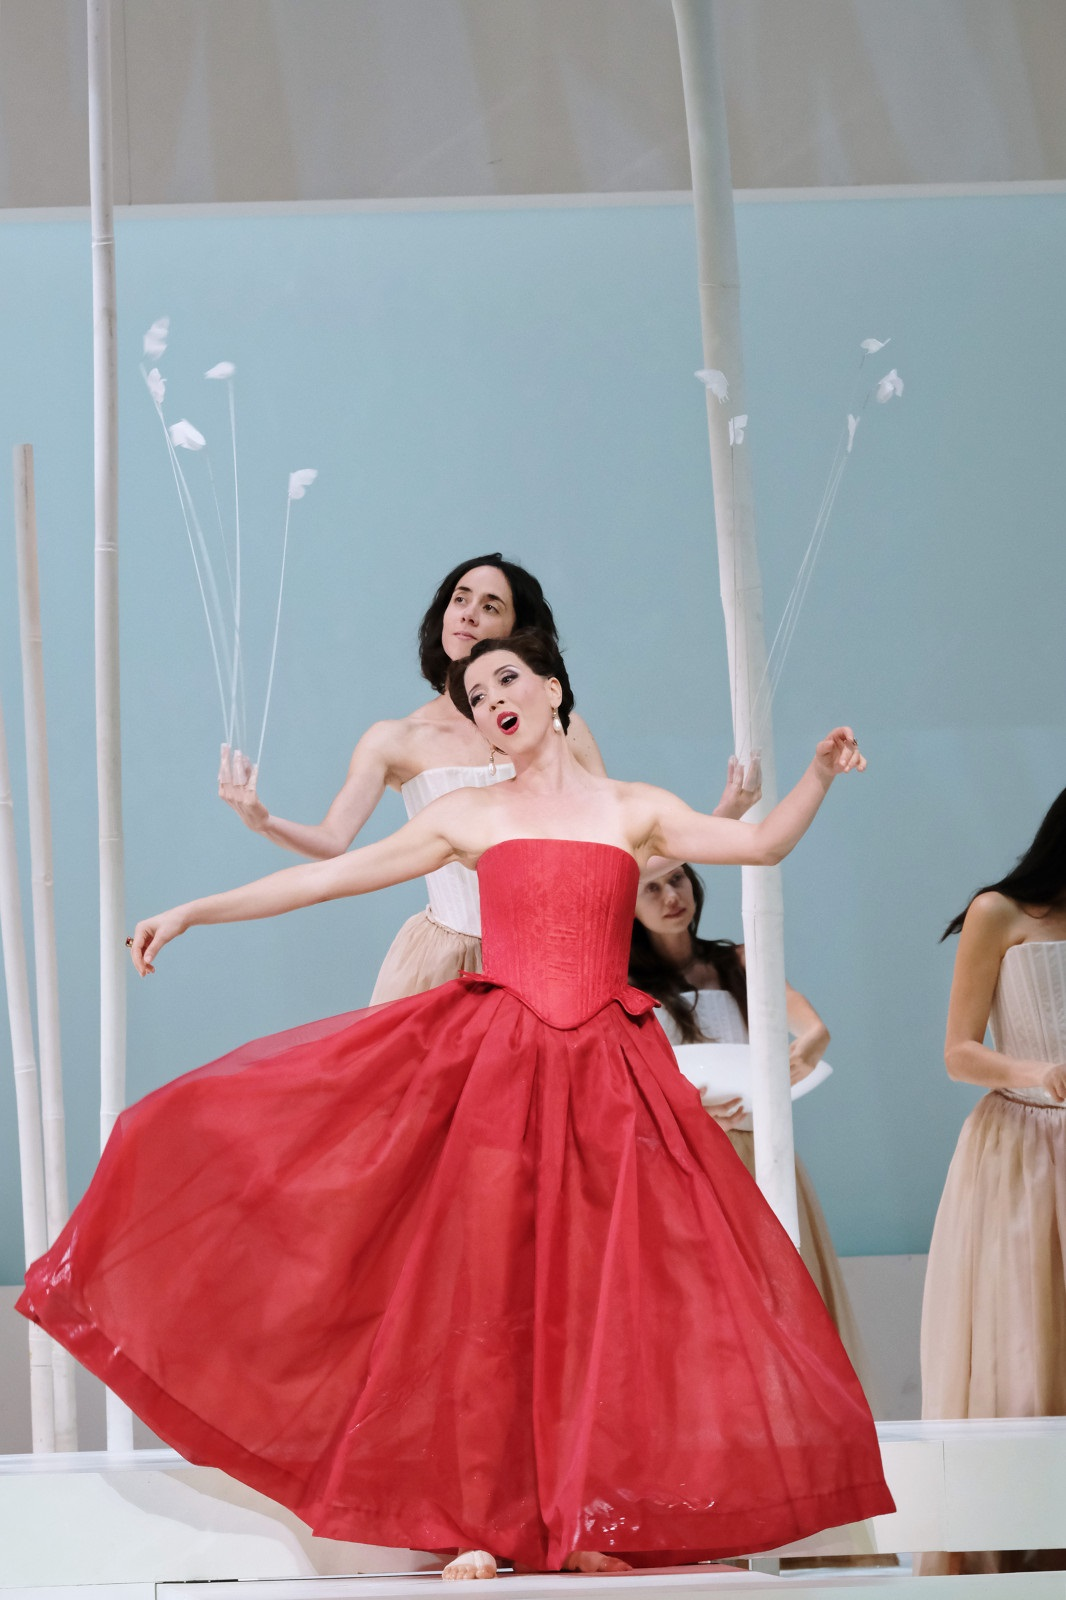 Lisette Oropesa - ph. Agathe Poupeney / Opéra national de Paris